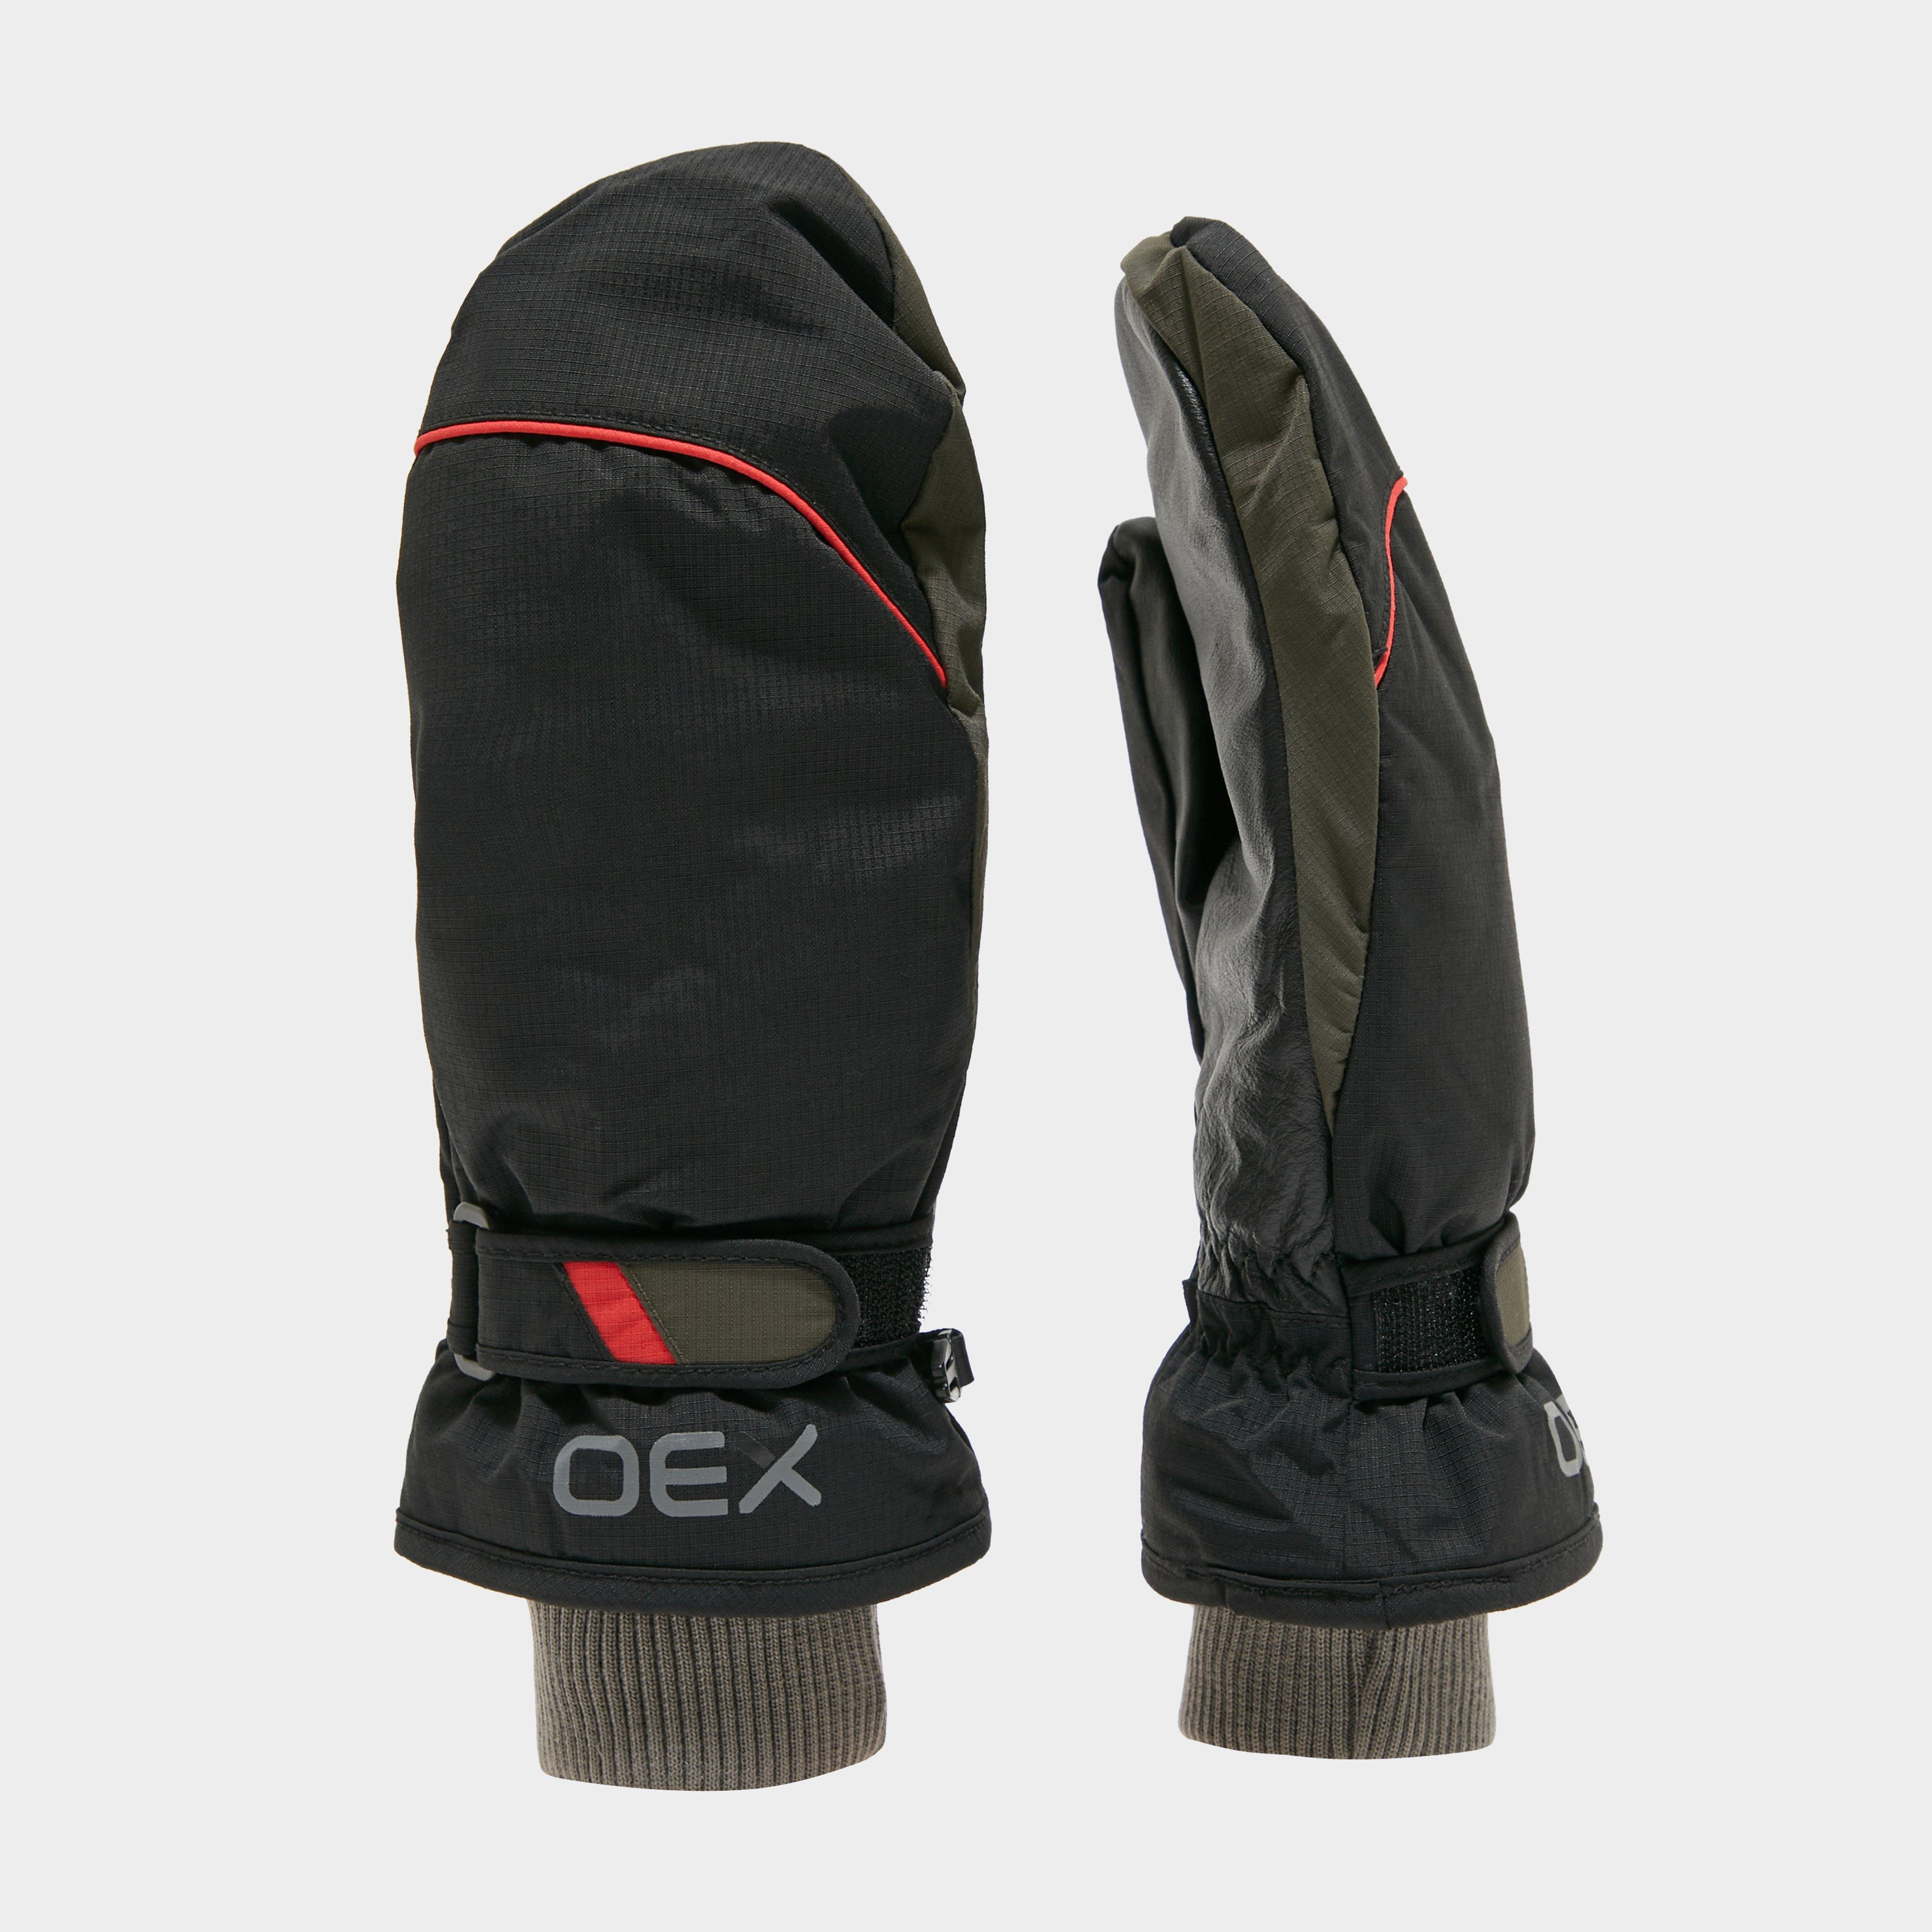 Oex Oex Summit Waterproof Mitts - Black, Black